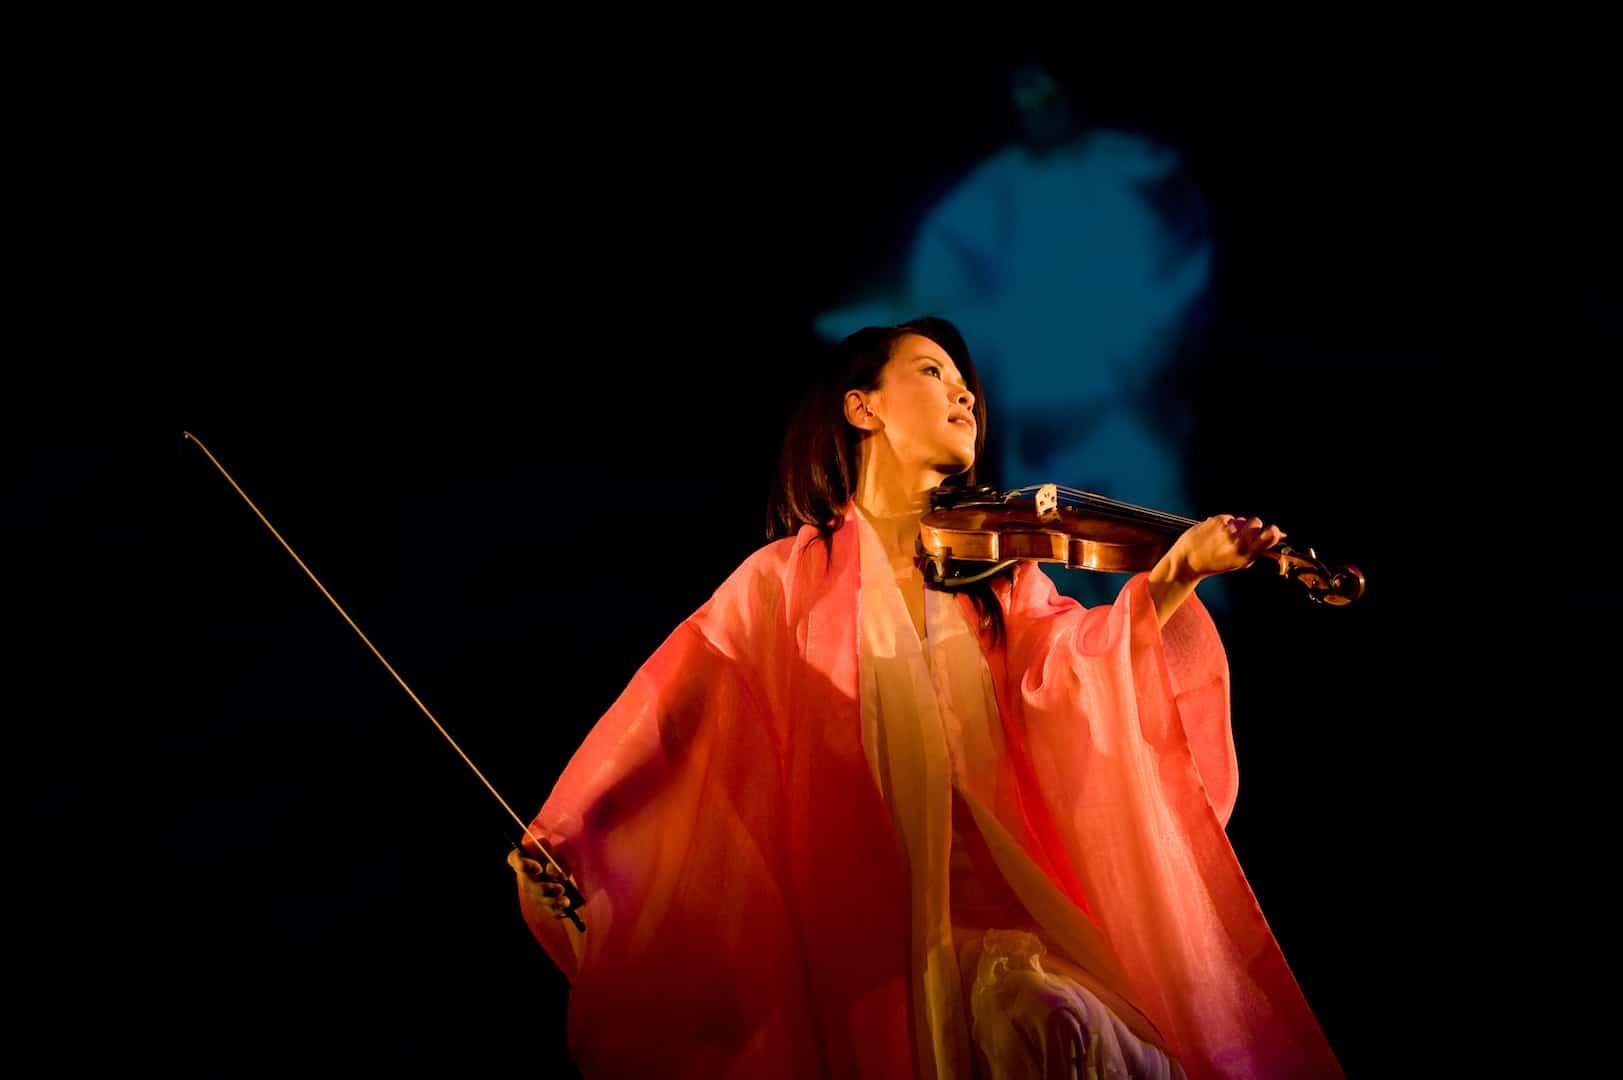 cherry blossom festival, violin